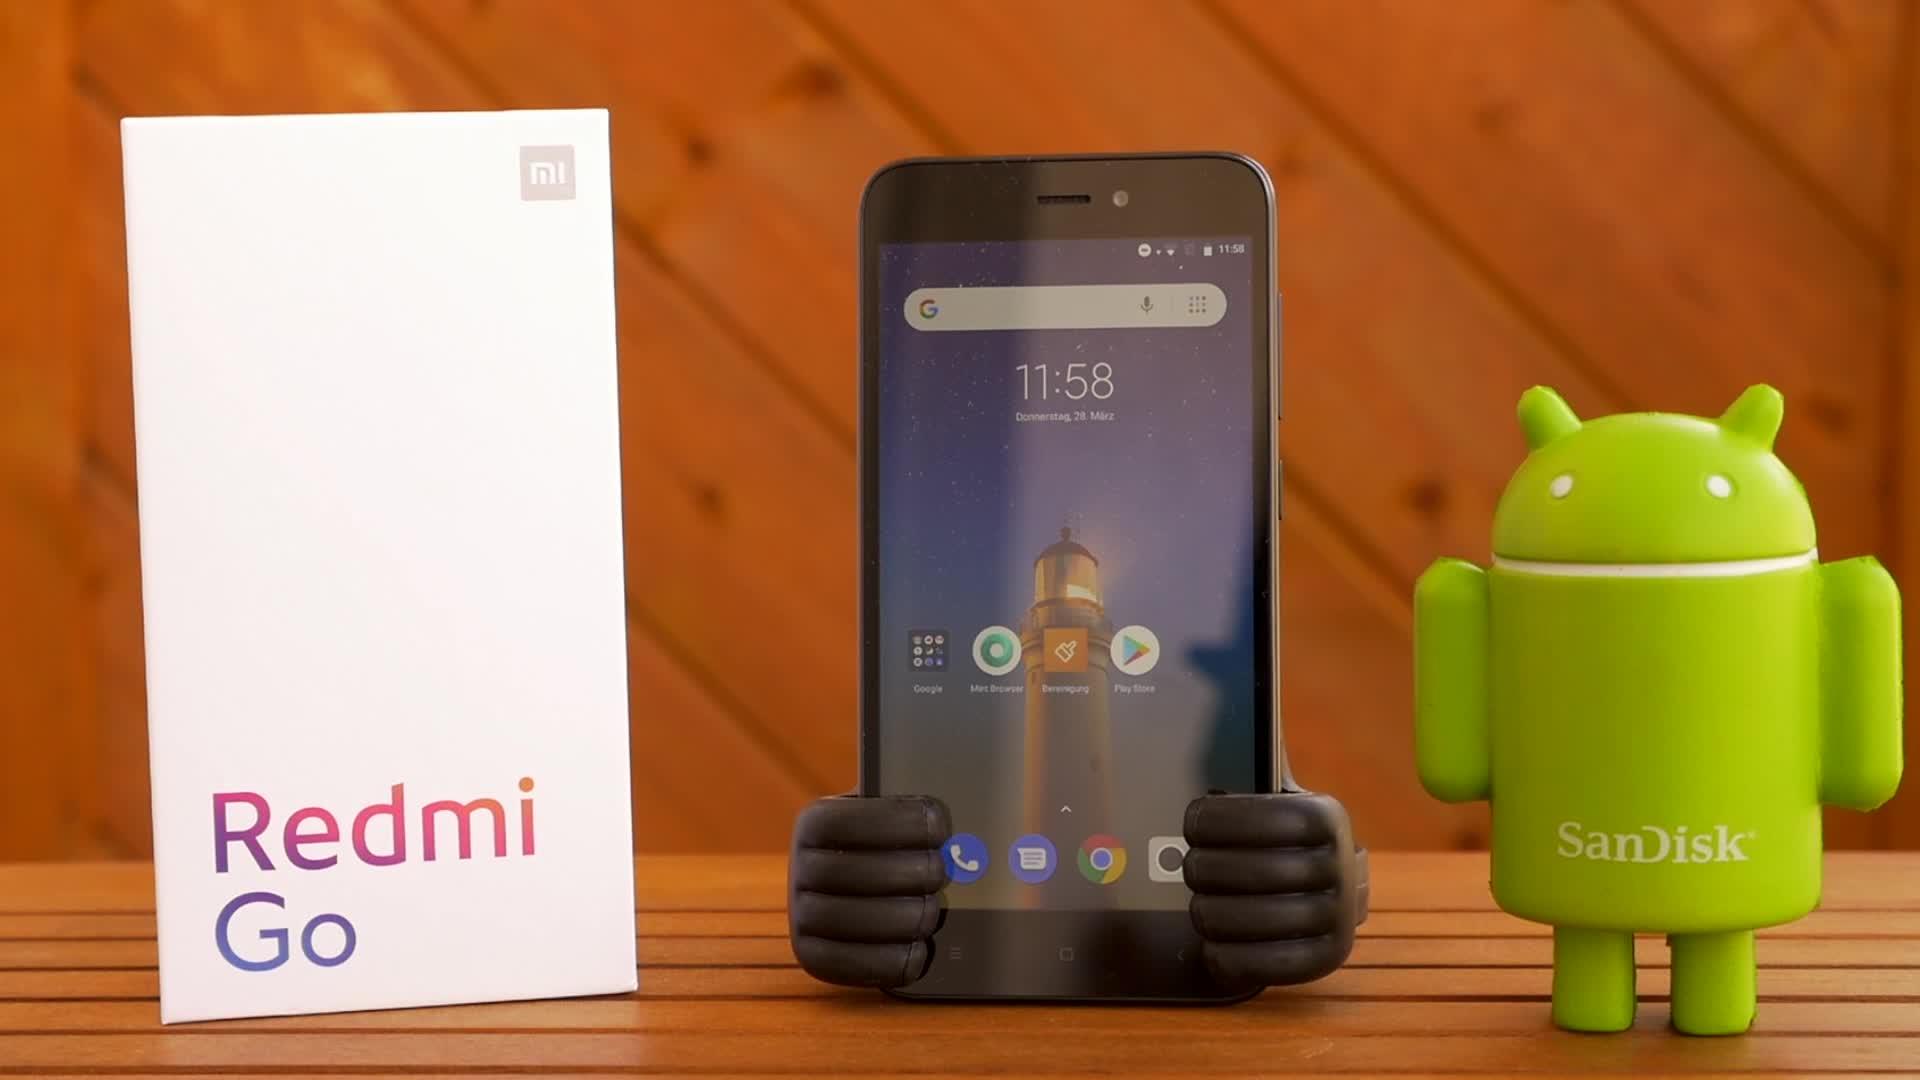 Smartphone, Test, Xiaomi, Timm Mohn, Android Go, Redmi Go